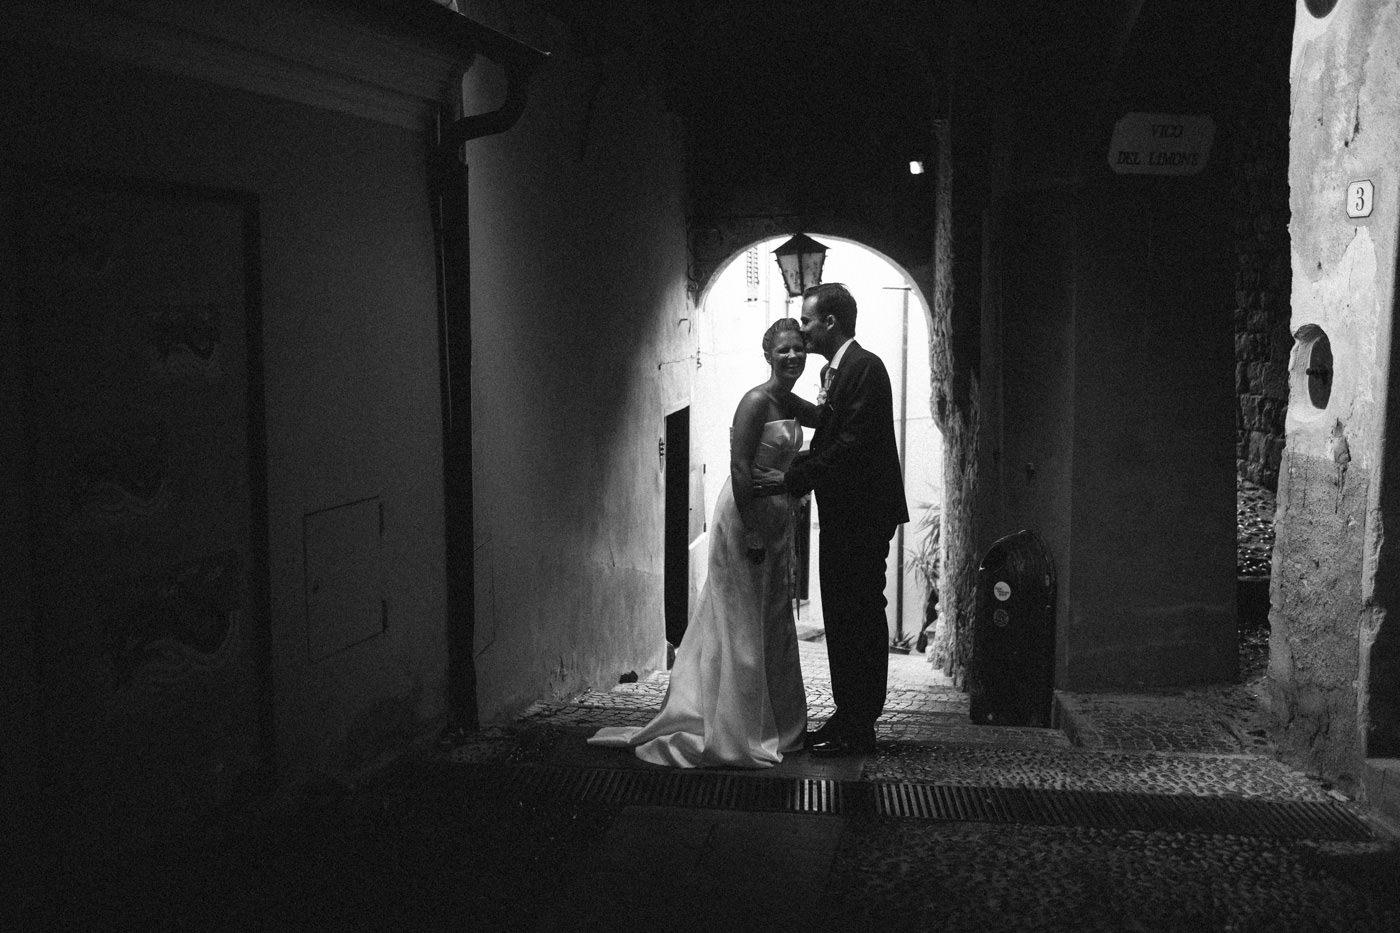 matrimoni_all_italiana_fotografo_matrimonio_cinque_terre-55.jpg